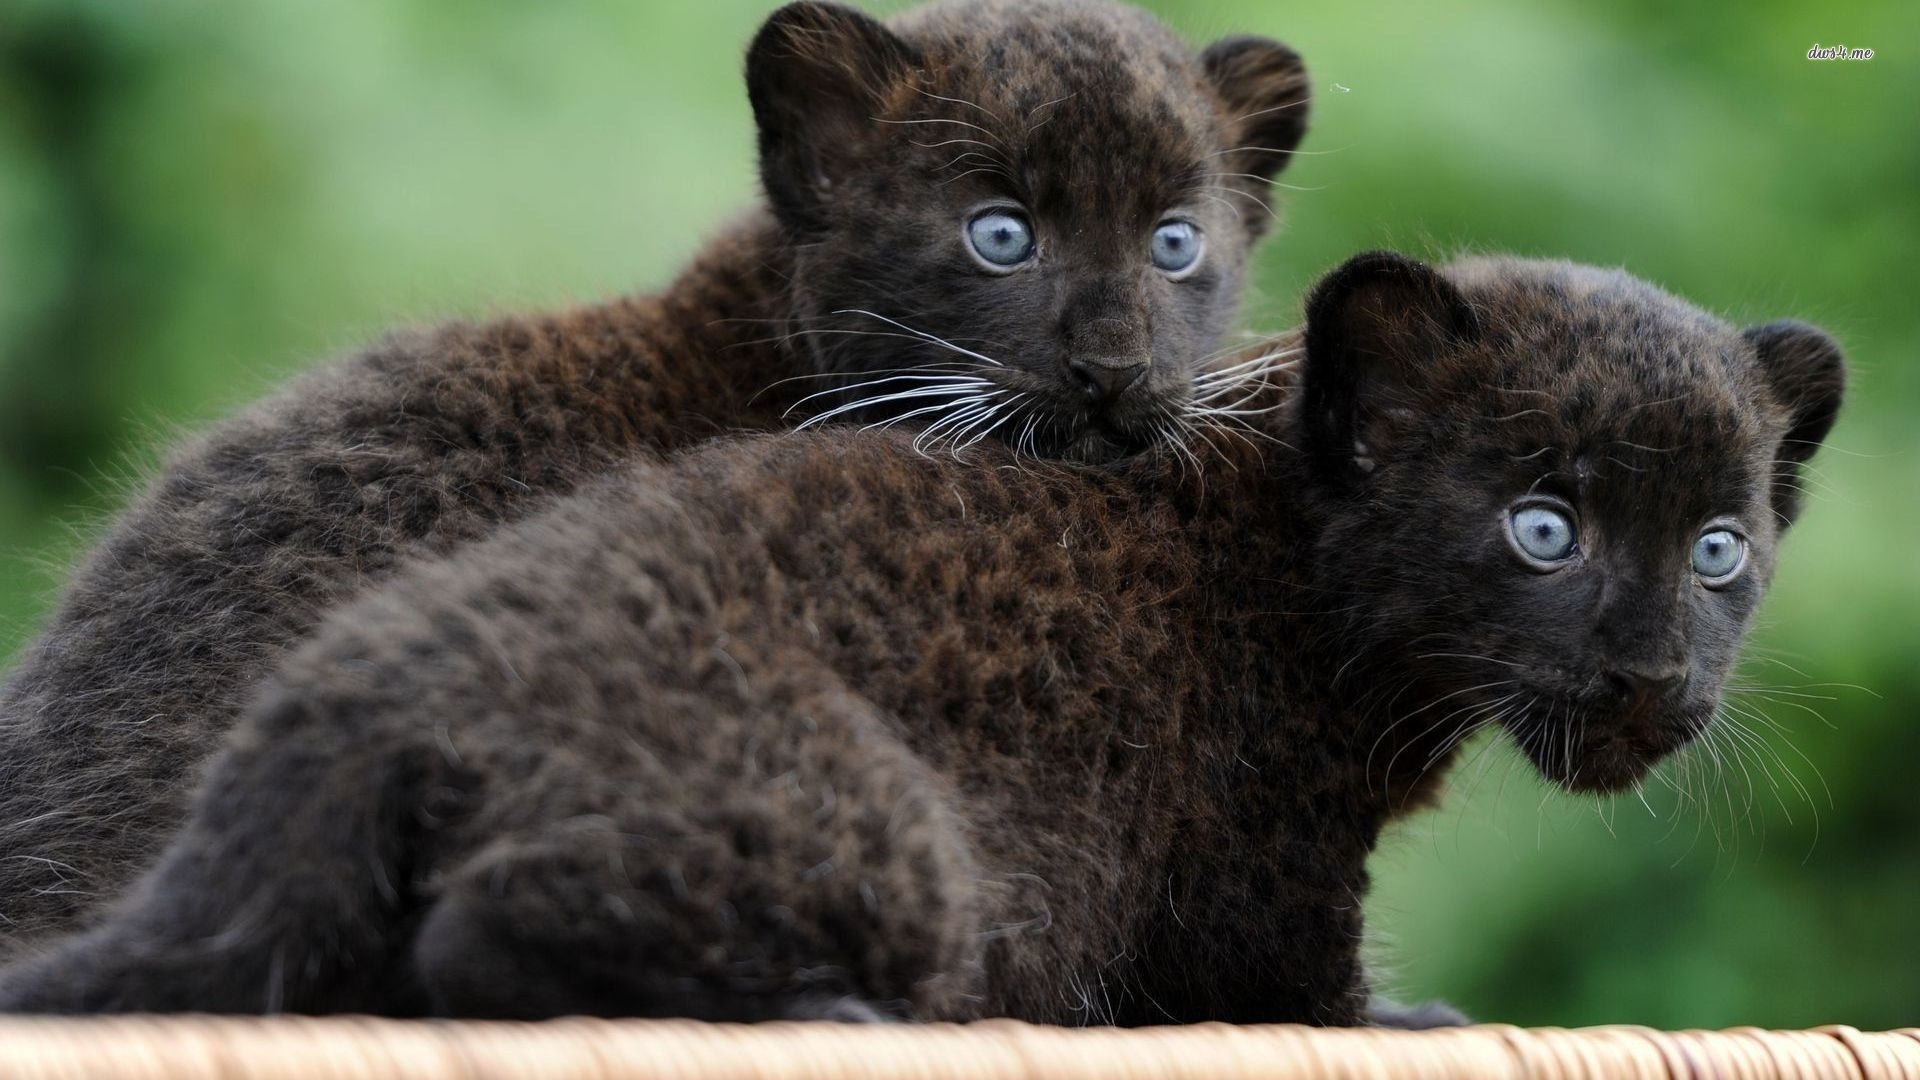 Black Panther Animal Wallpapers: Panther Wallpaper (71+ Images